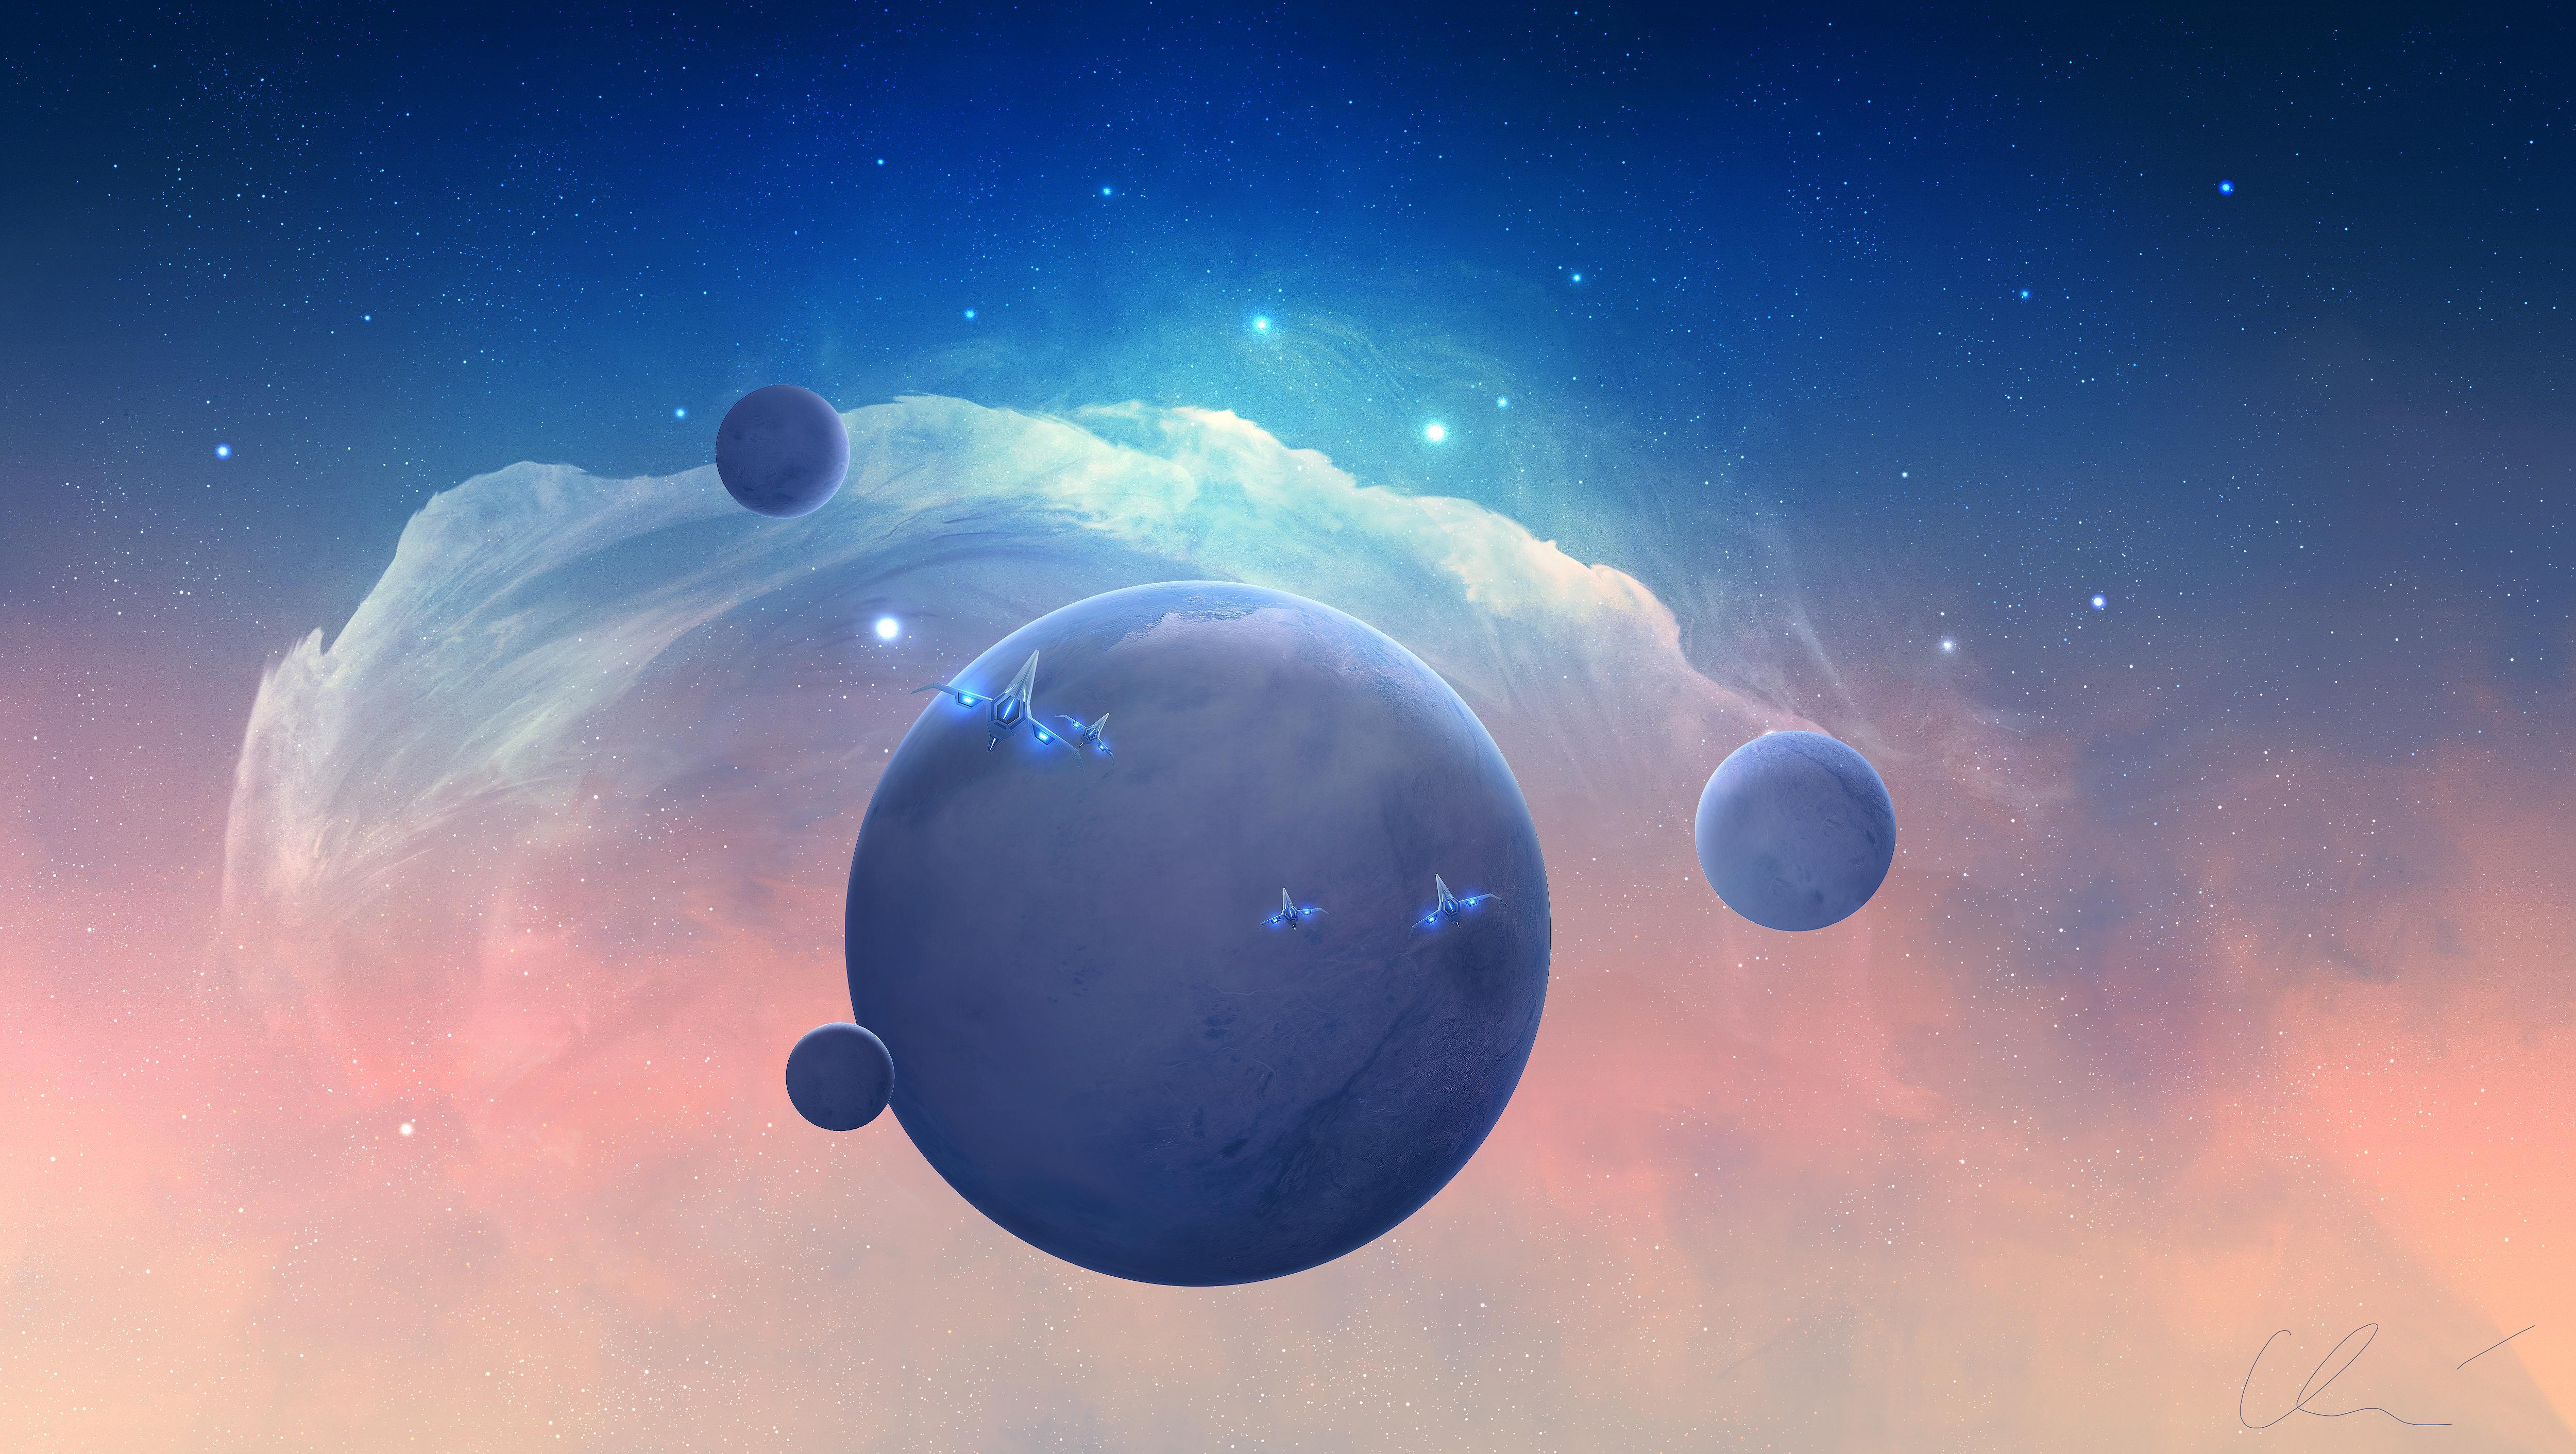 Science Fiction Wallpaper 1280x1024